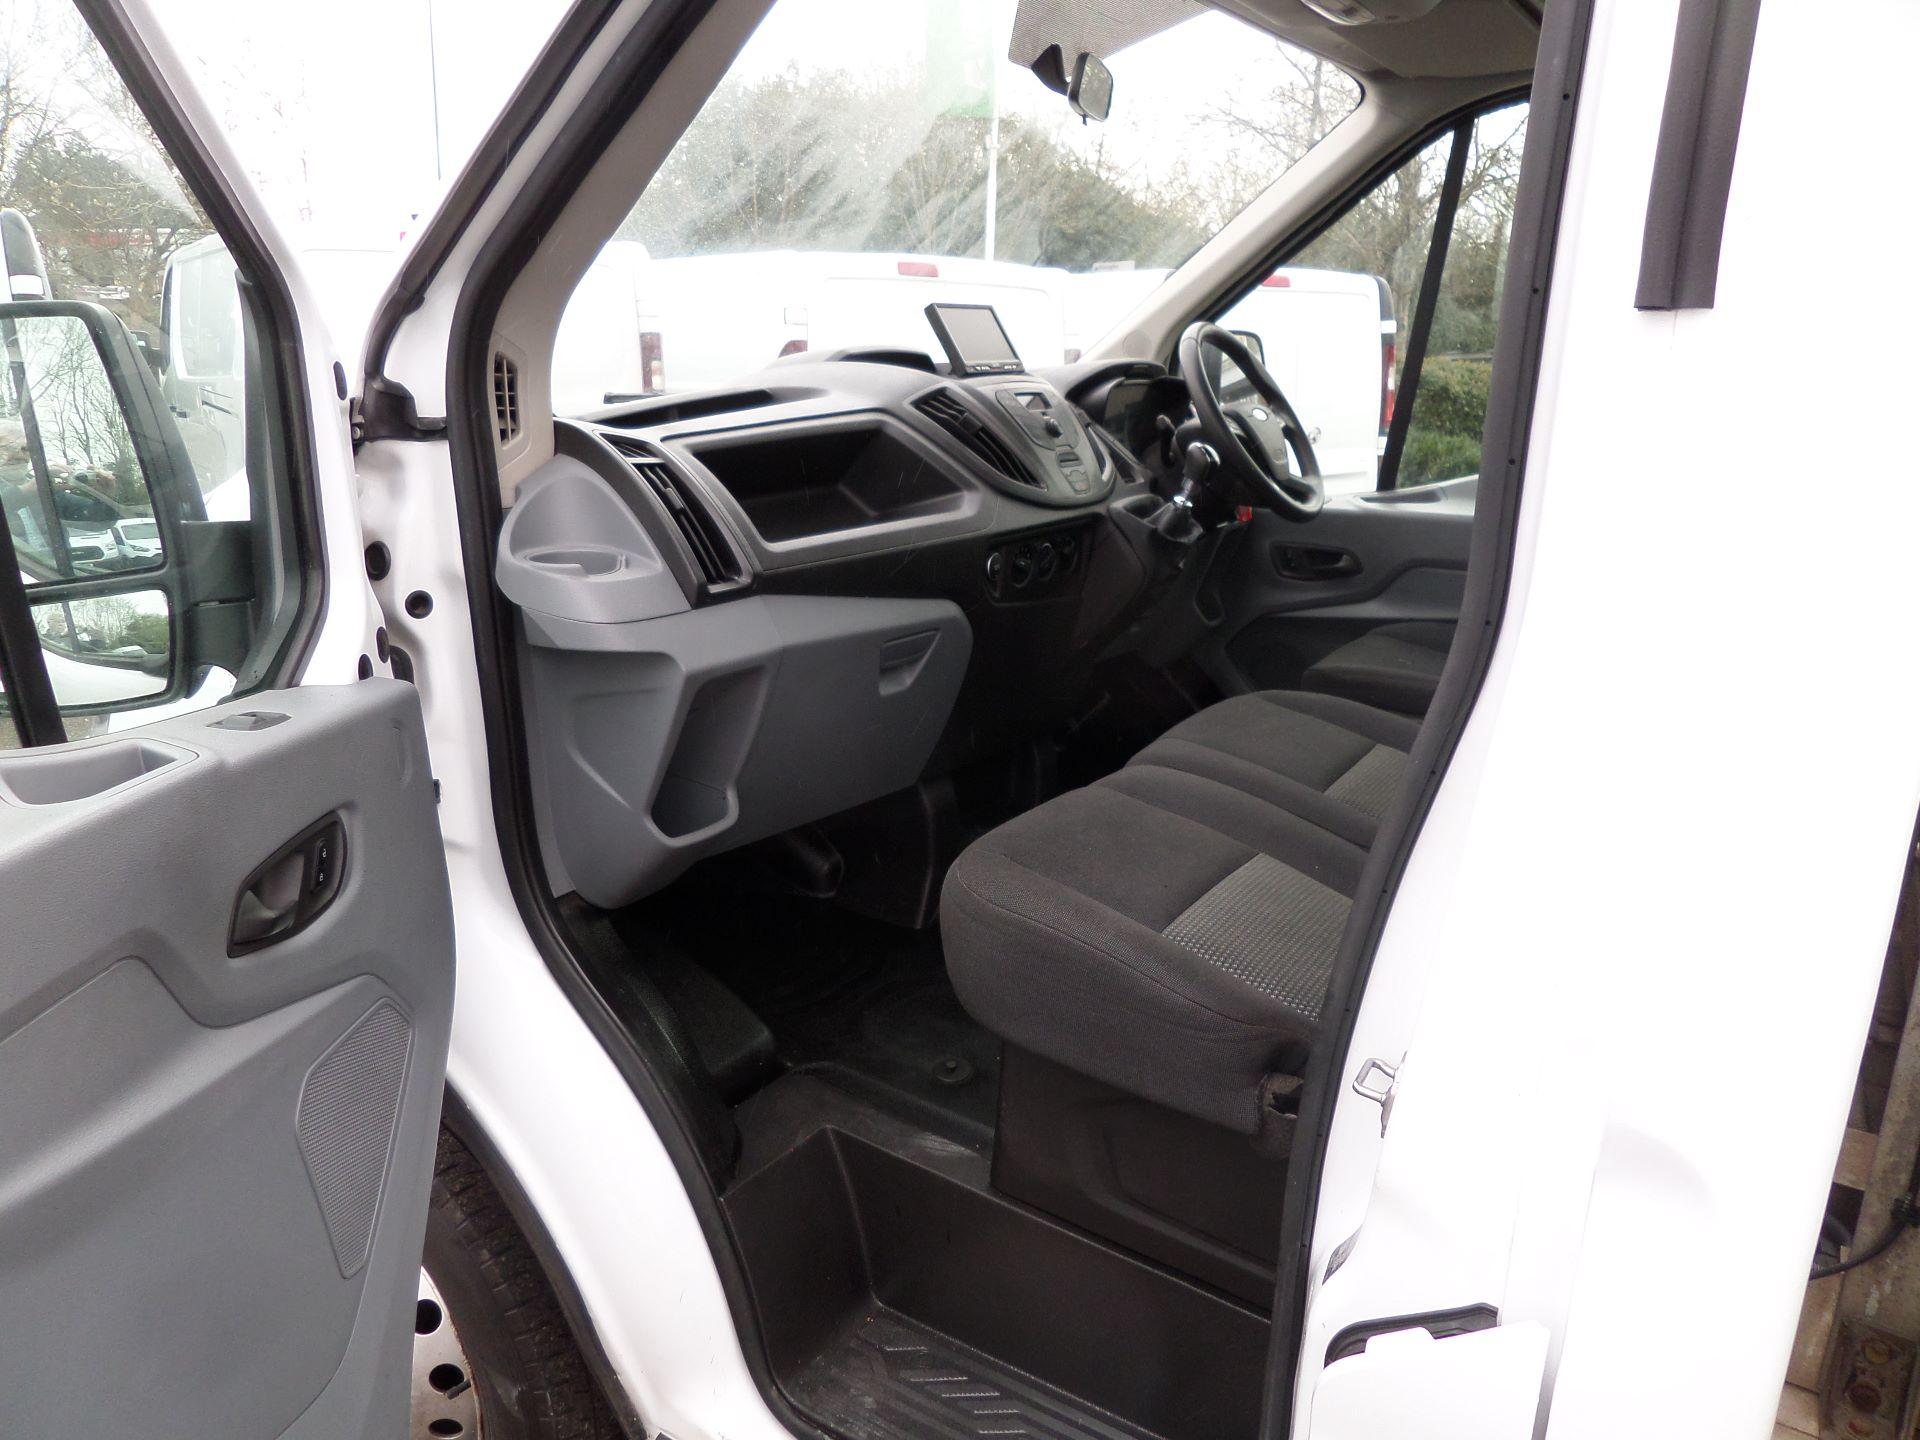 2017 Ford Transit 2.0 Tdci 130Ps L4 Dropside Euro 6 (MA17NHF) Image 6